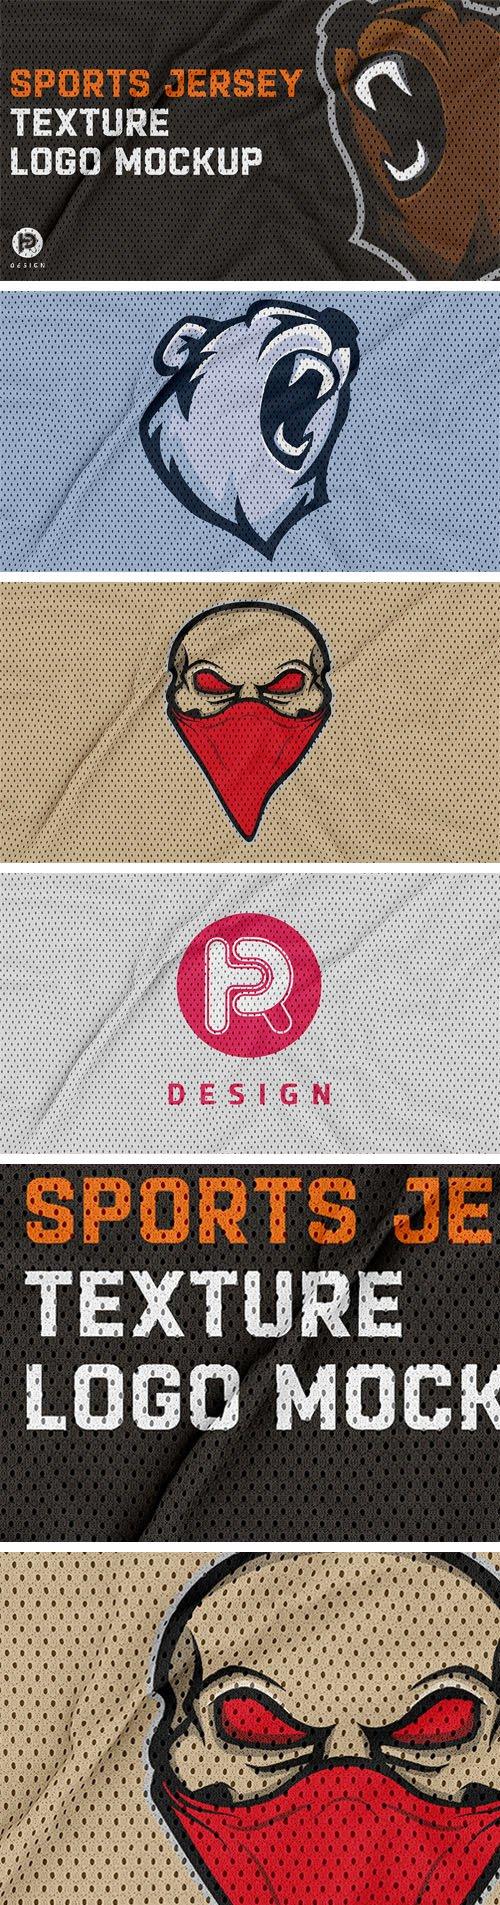 Jersey Texture Logo PSD Mockup